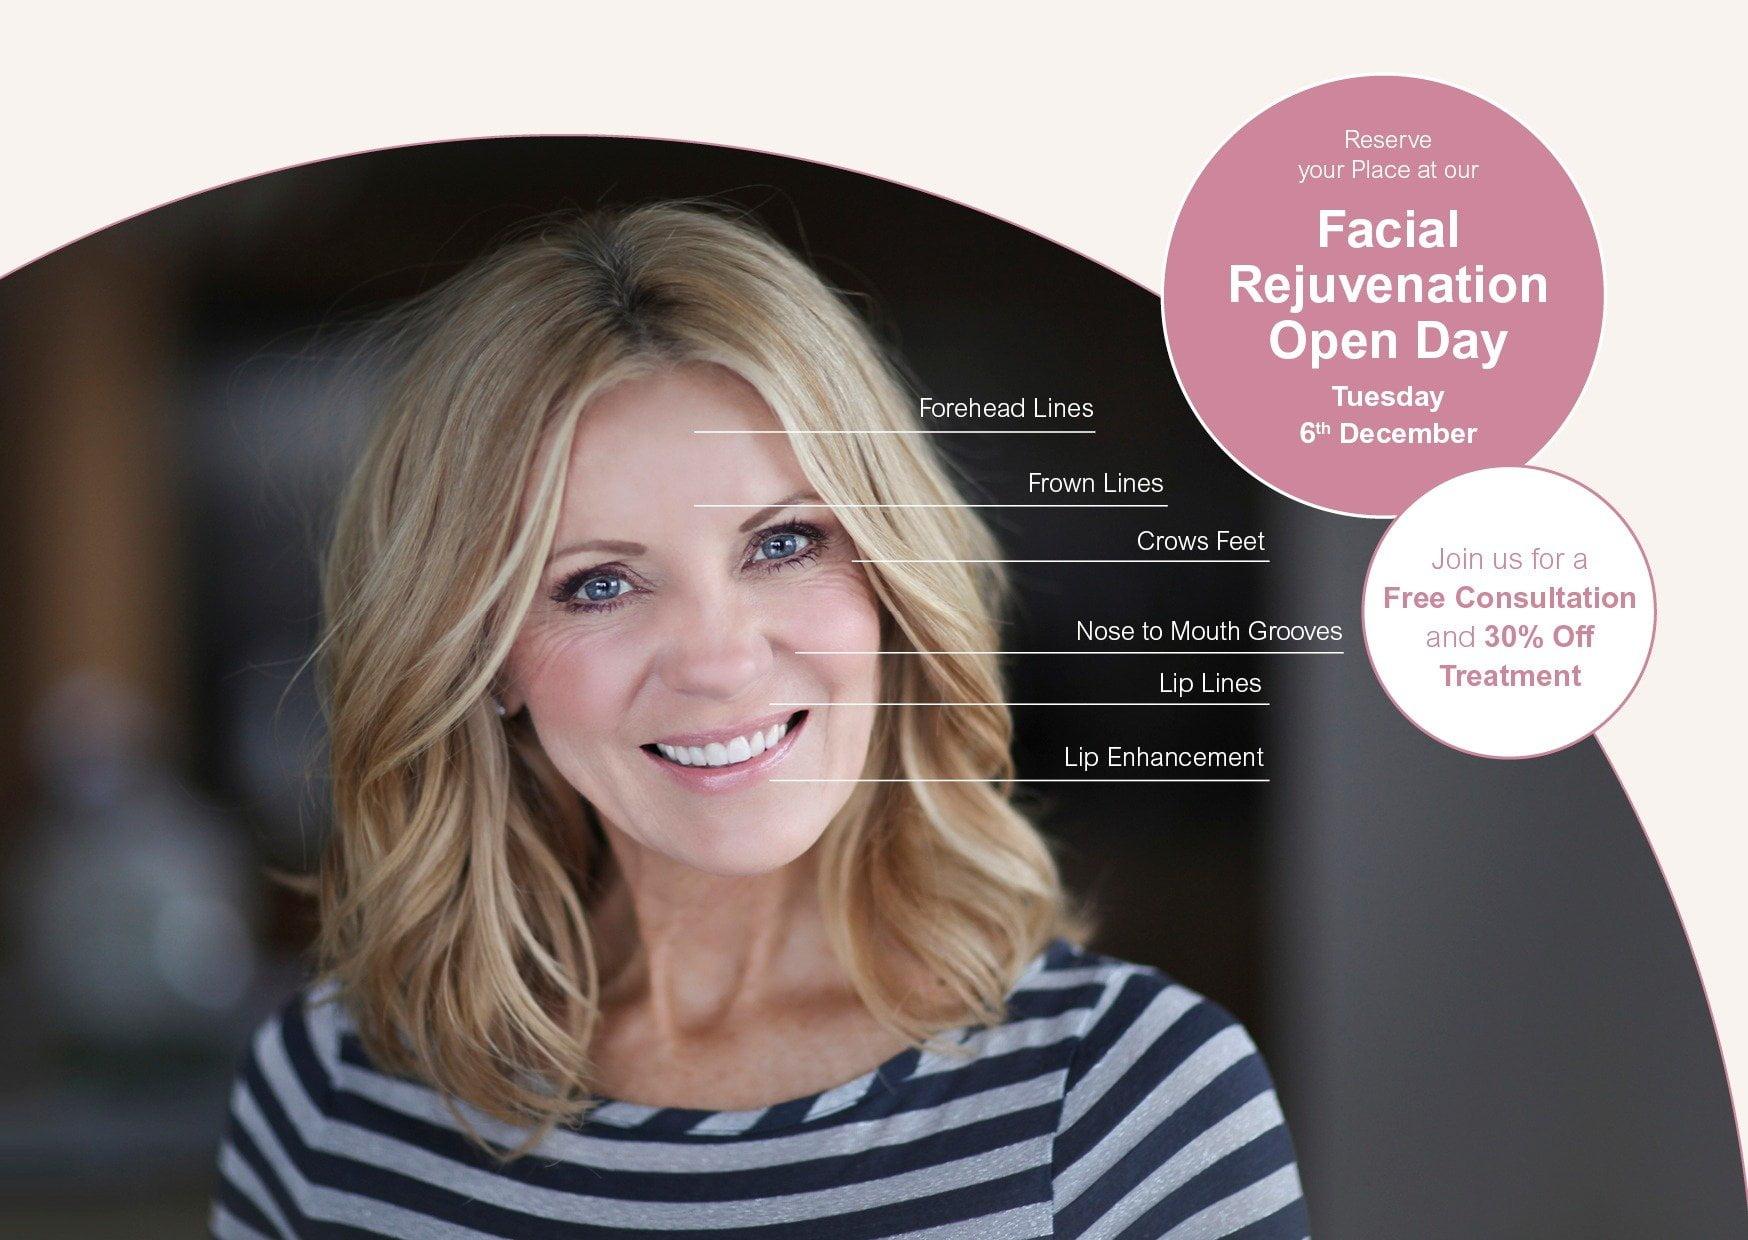 Open Day Facial Rejuvenation